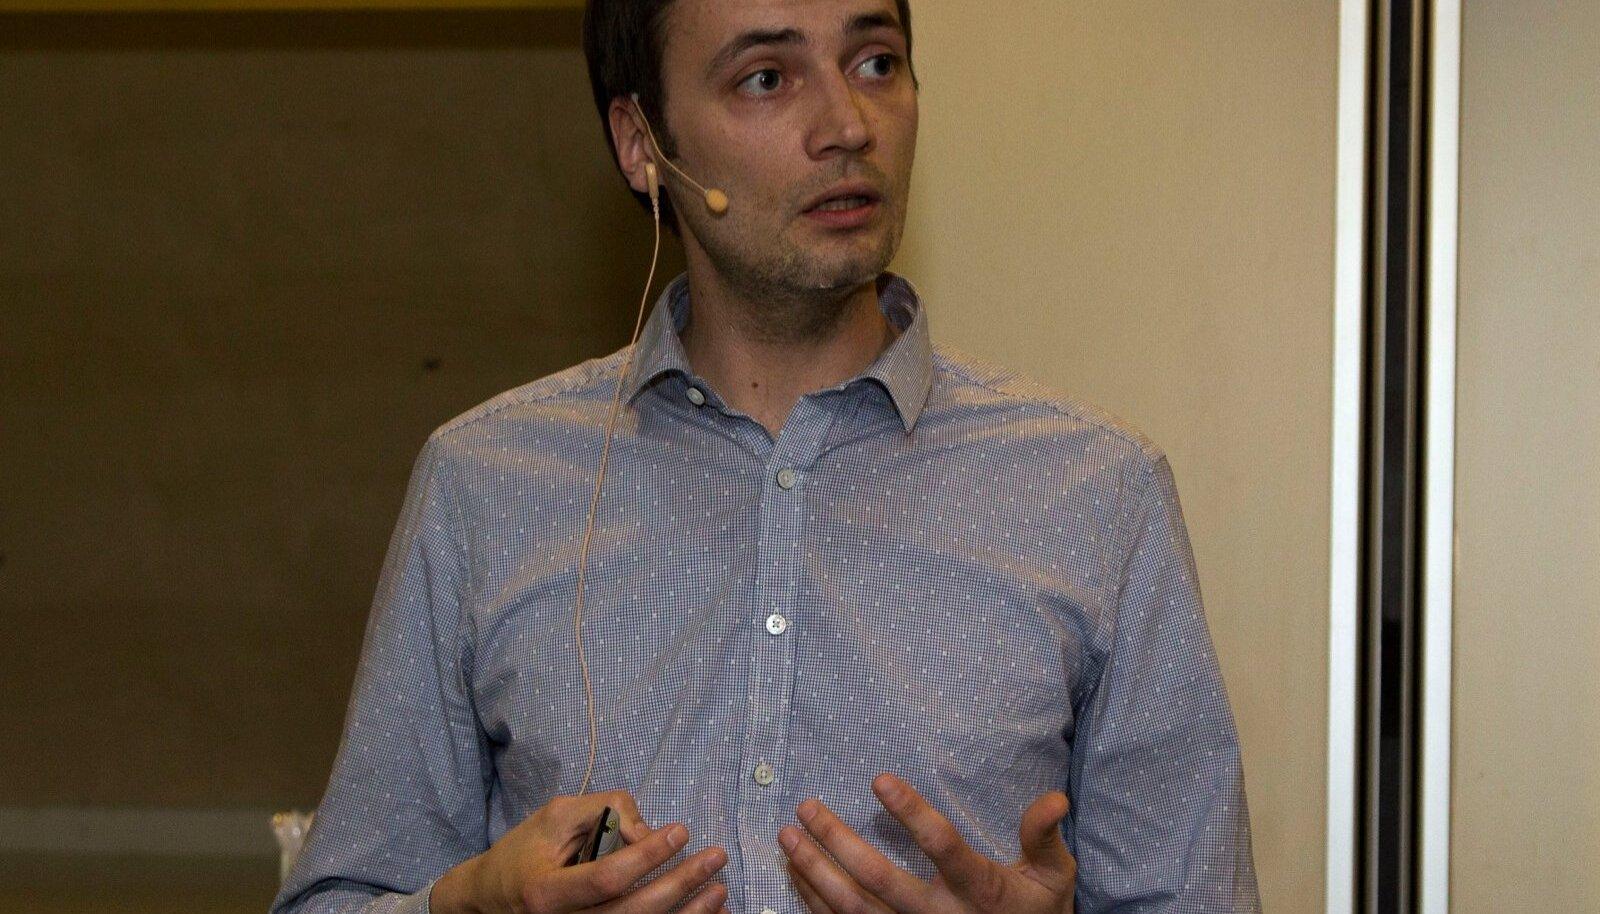 Marius Ivanovas